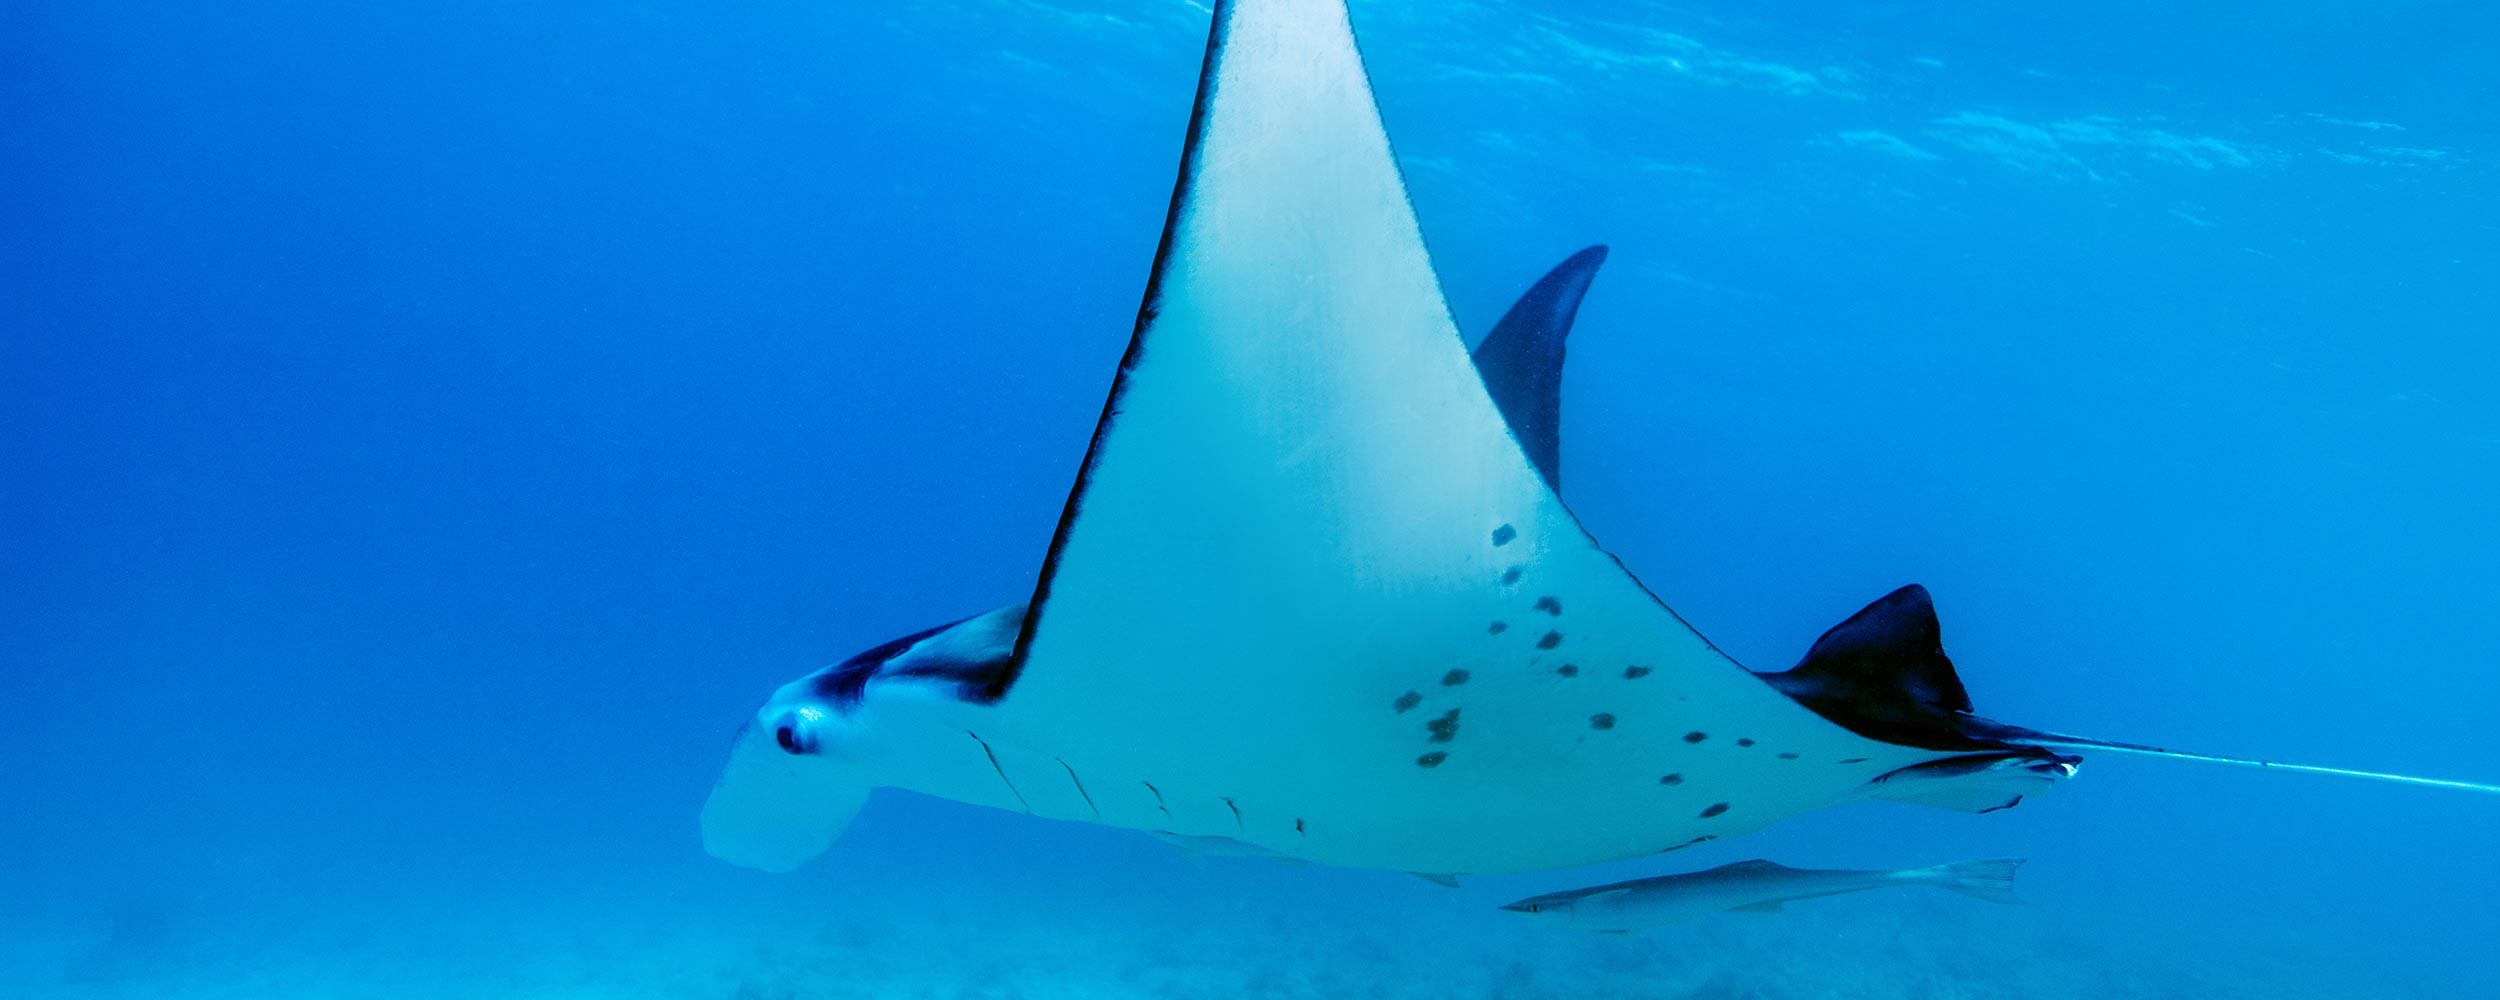 Polynésie Française plongée sous marine raie manta